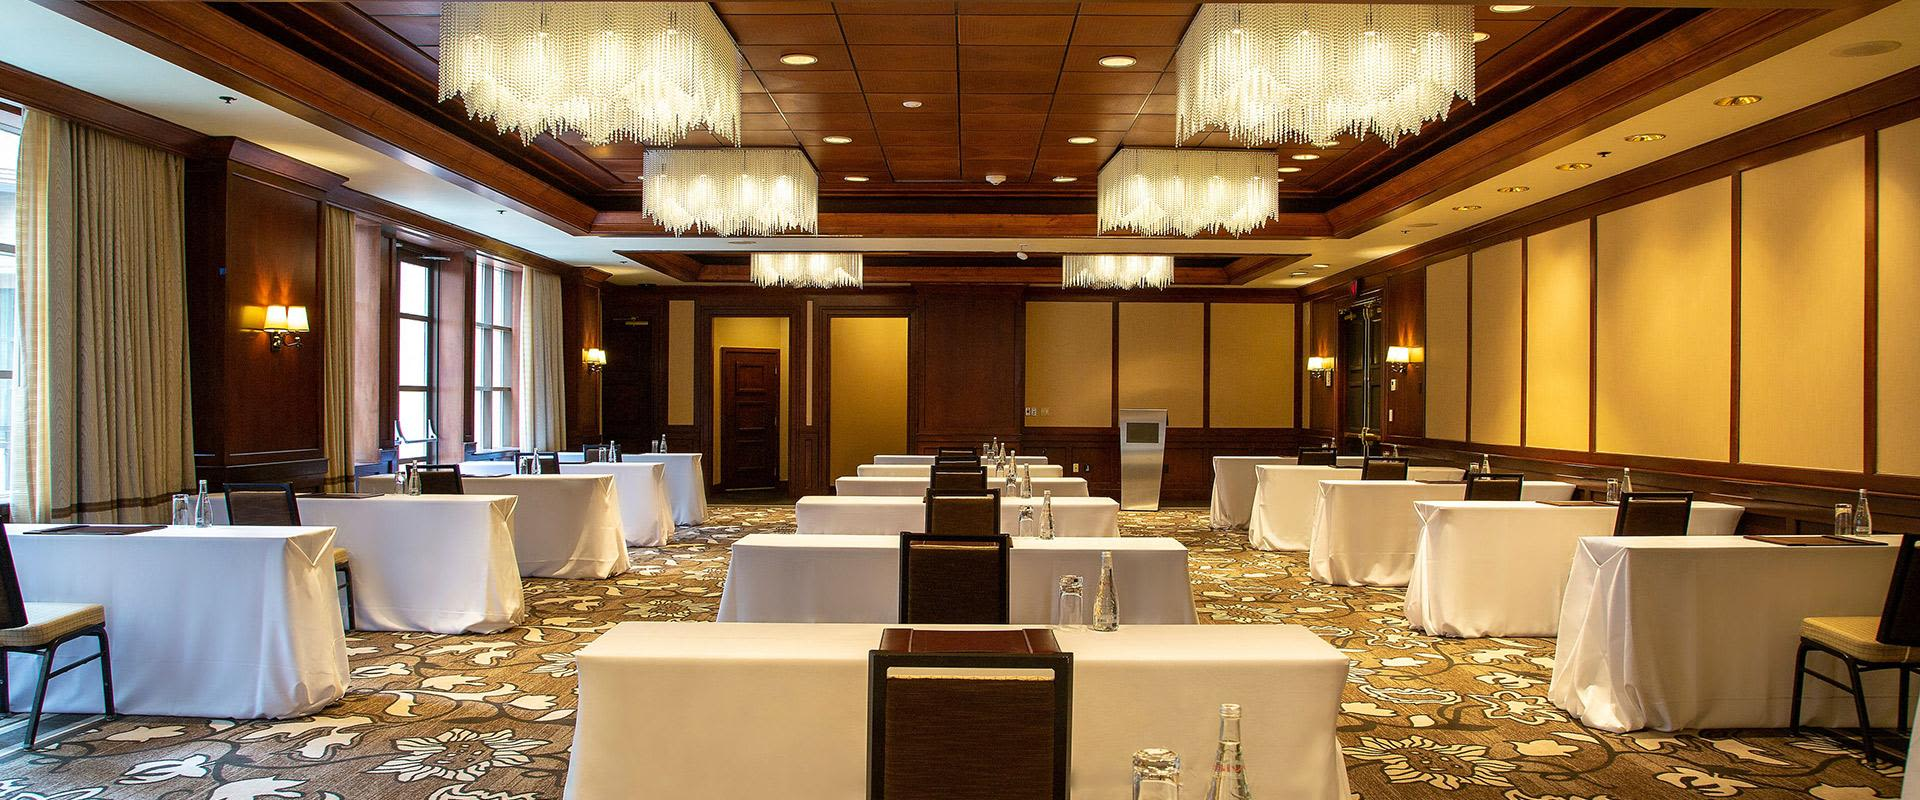 Yorkville Toronto Meeting Room With Podium